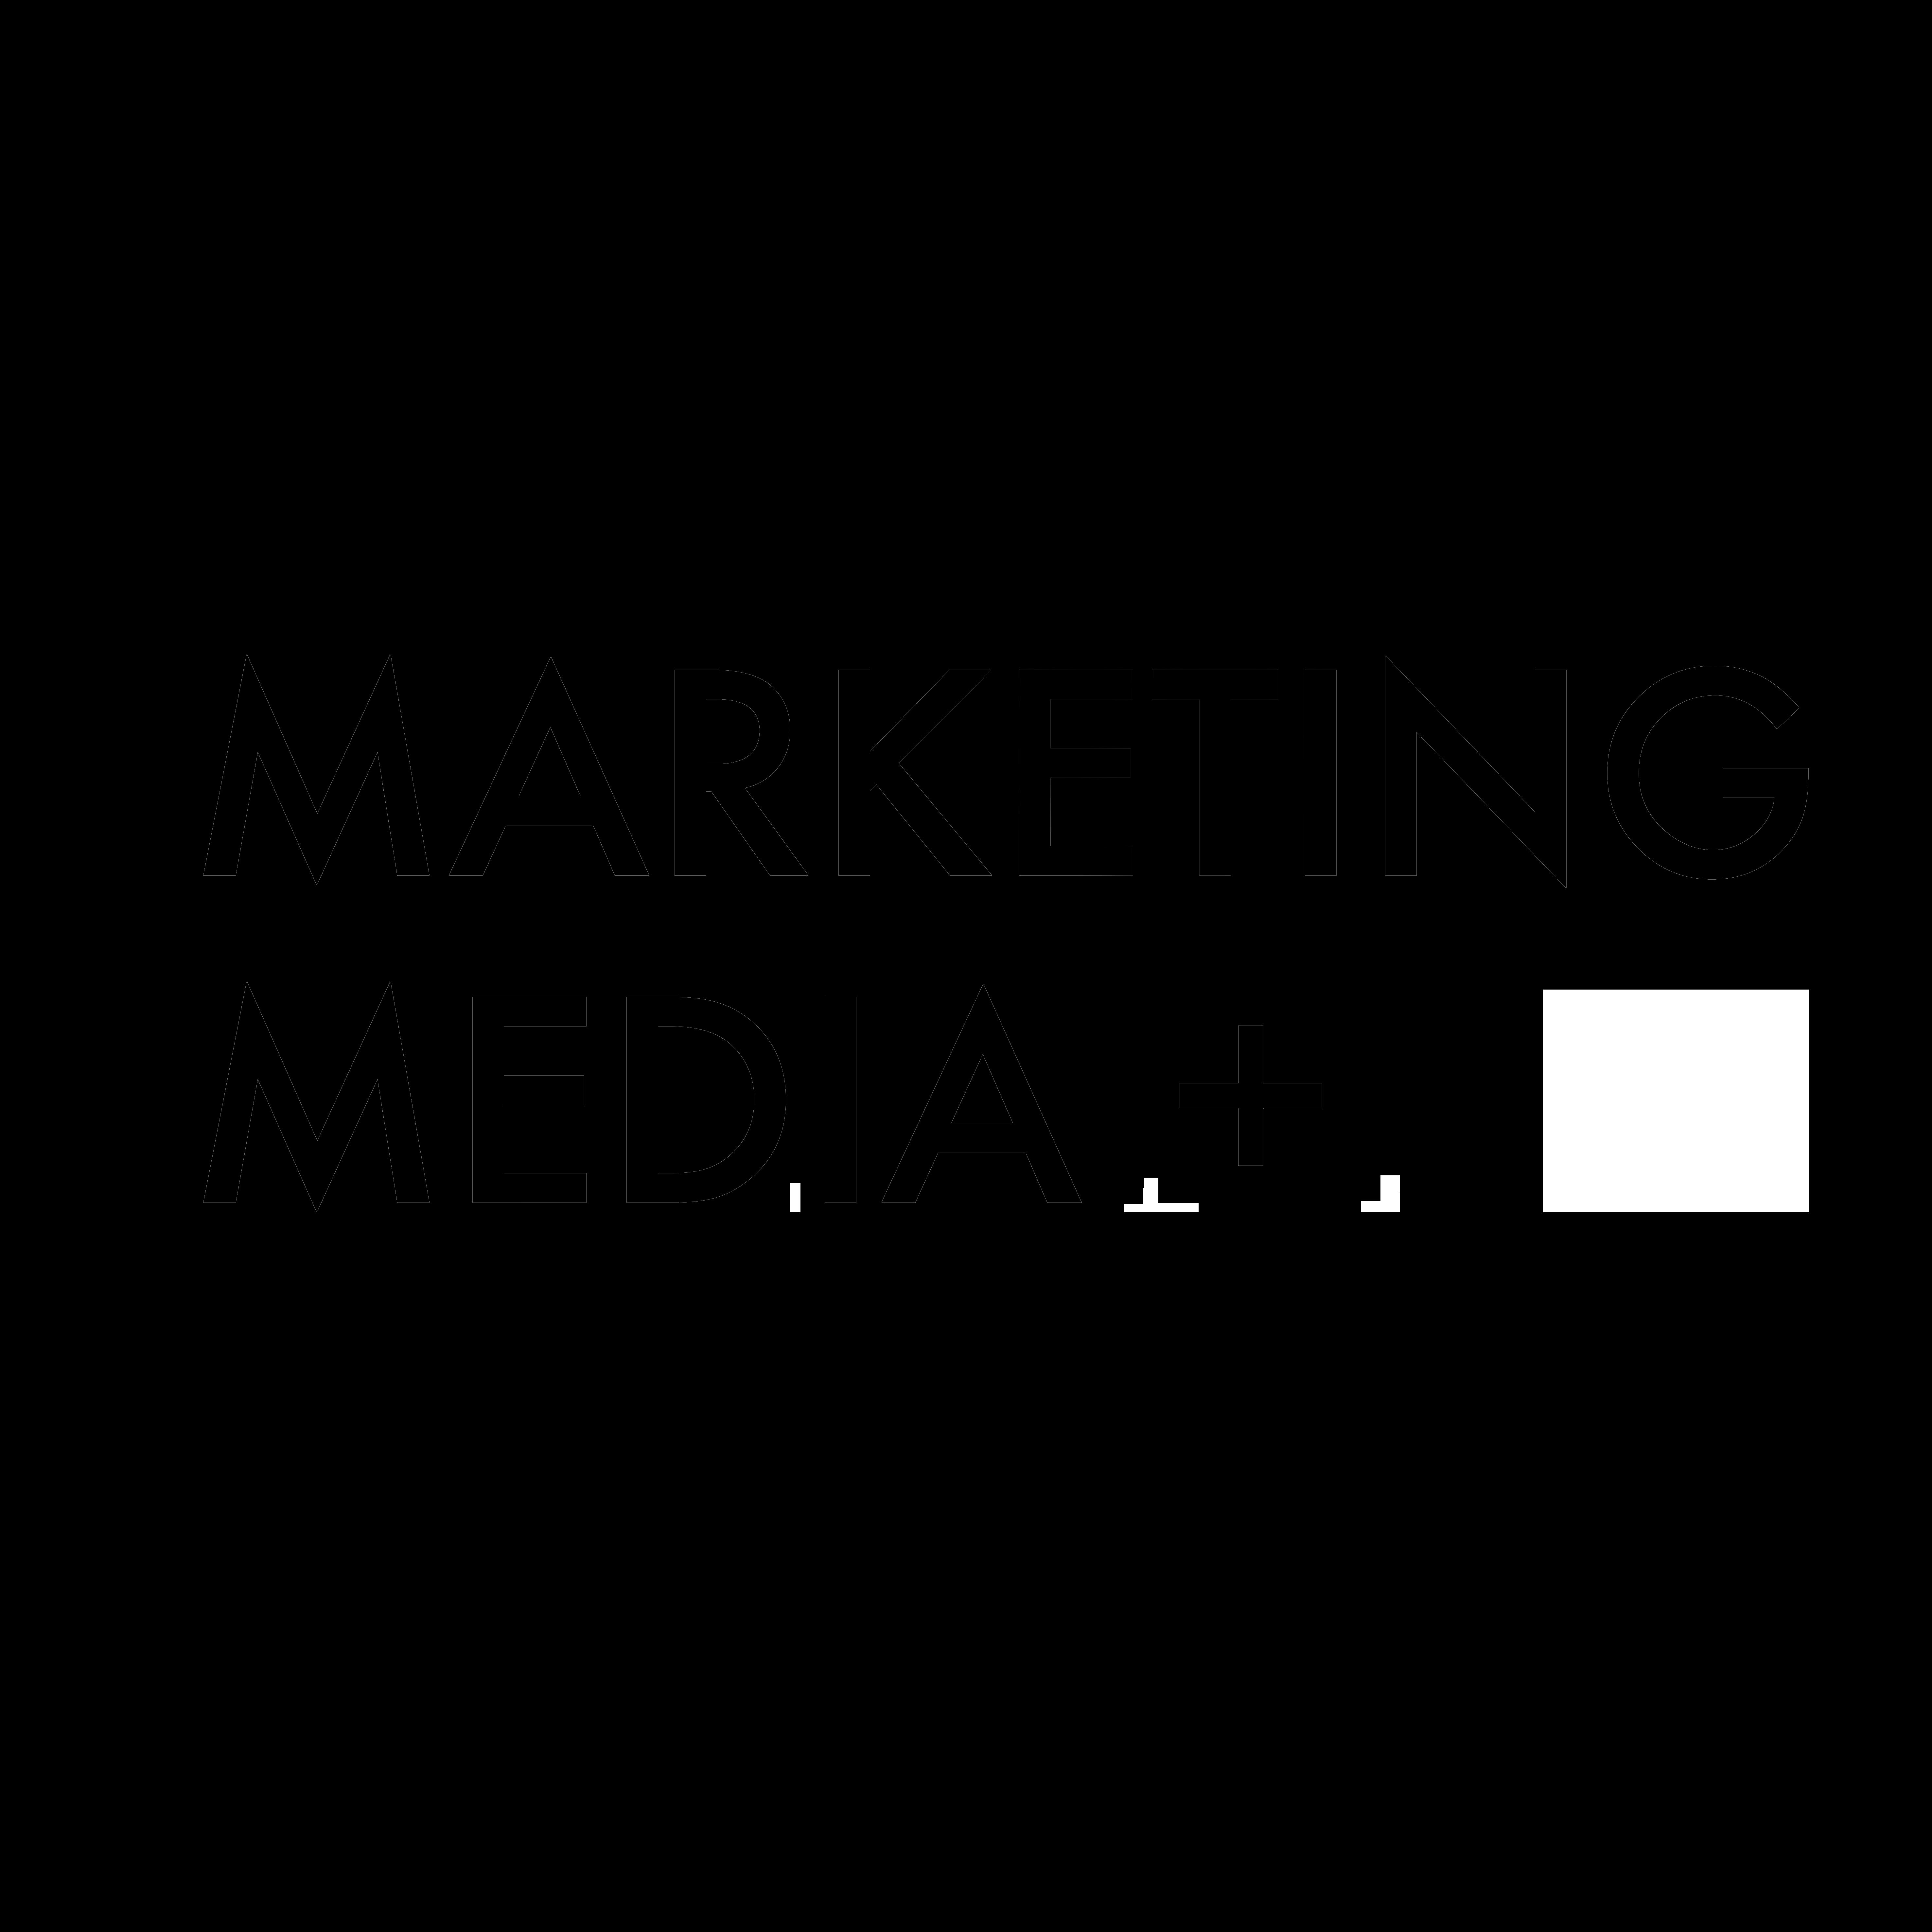 Marketing Media Plus, a chatbot developer